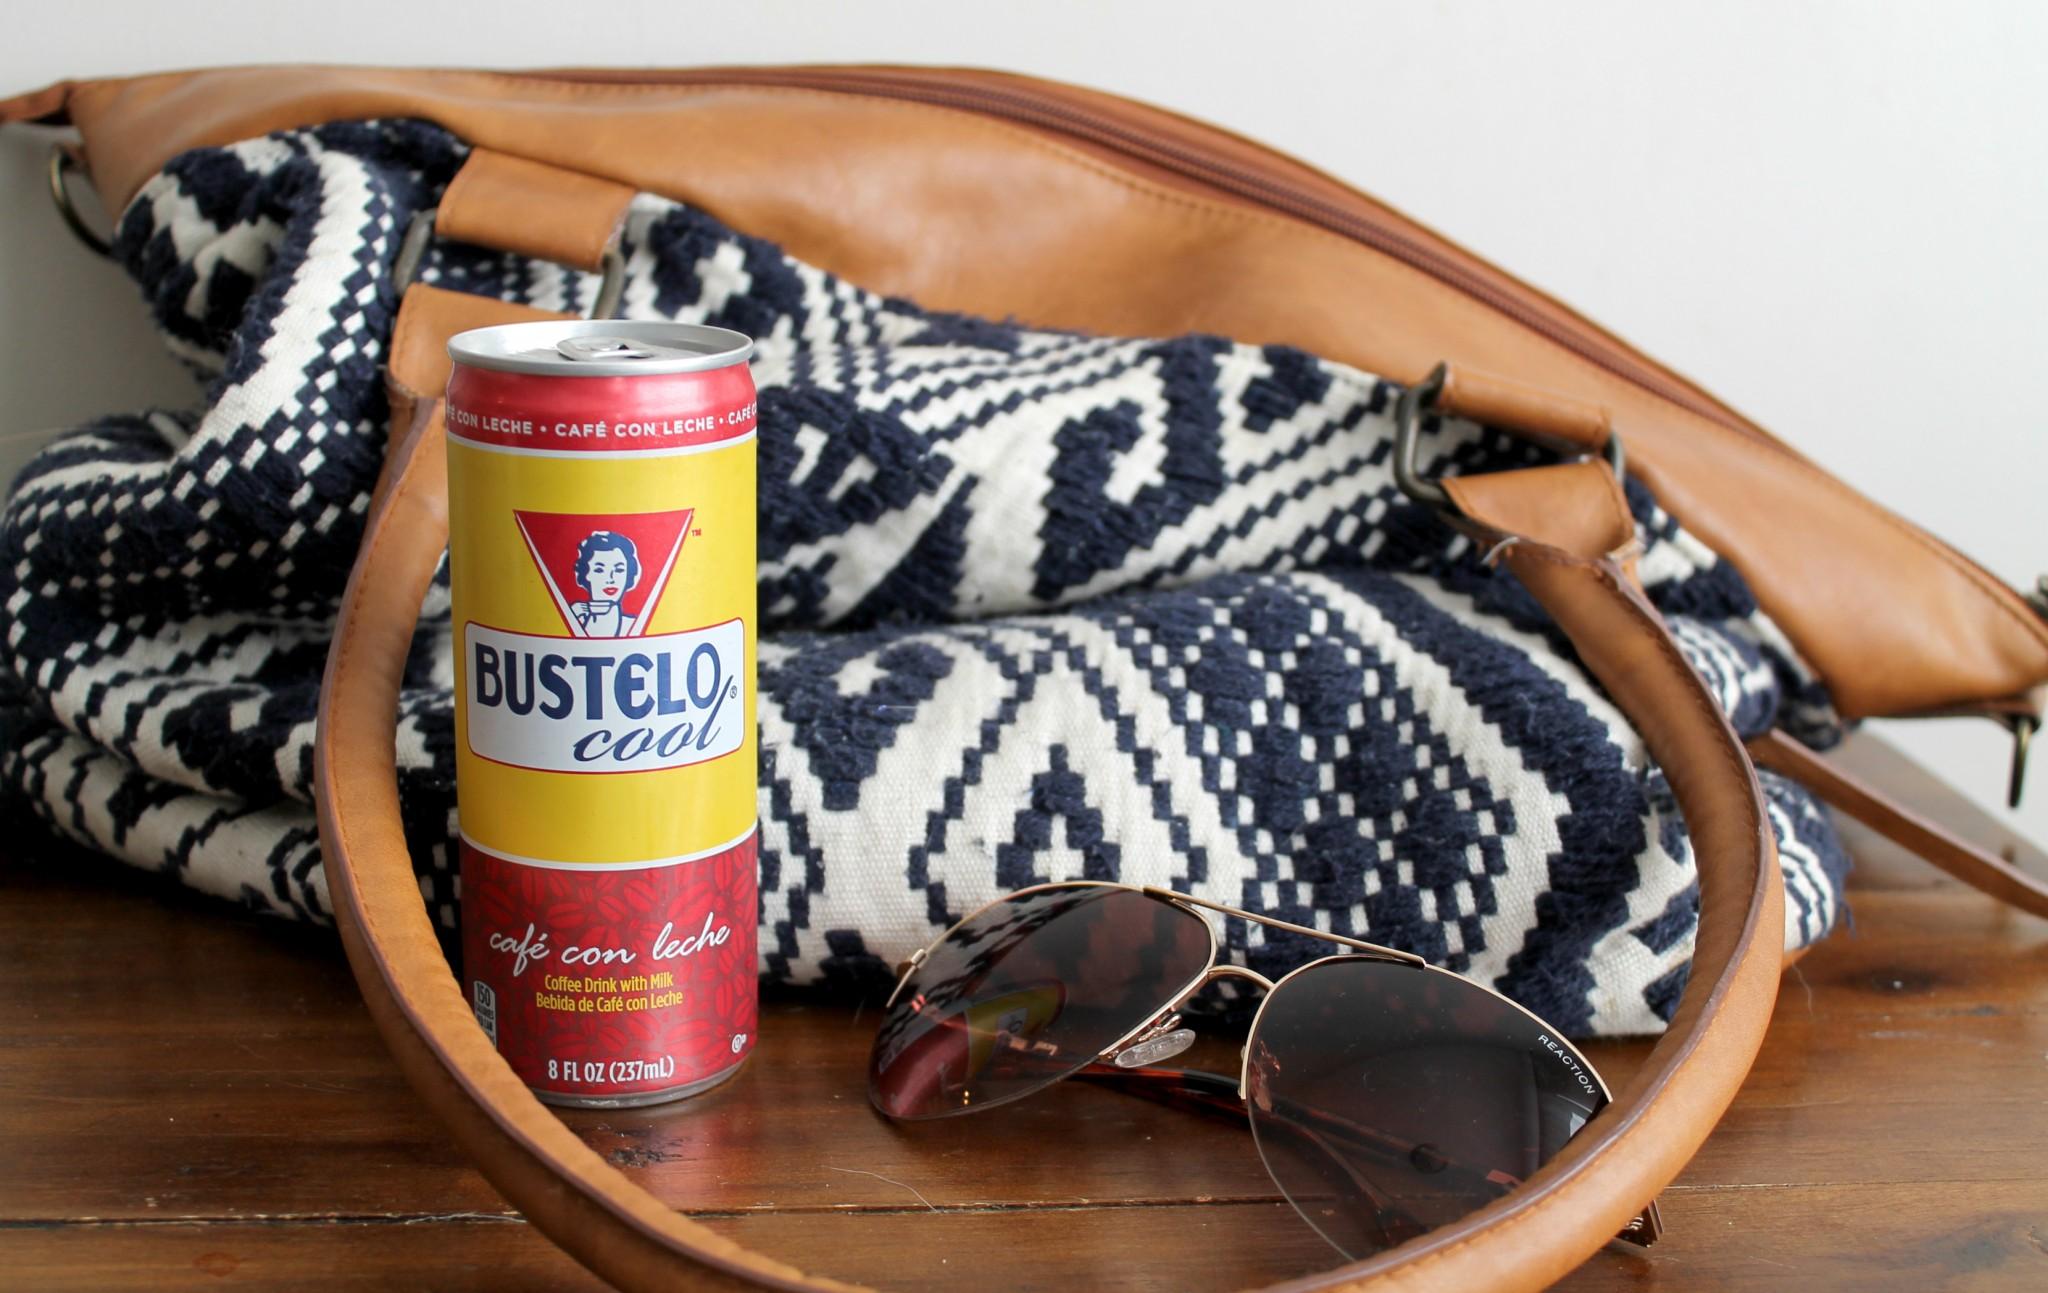 Bustelo Cool® Coffee Drinks at Walmart!